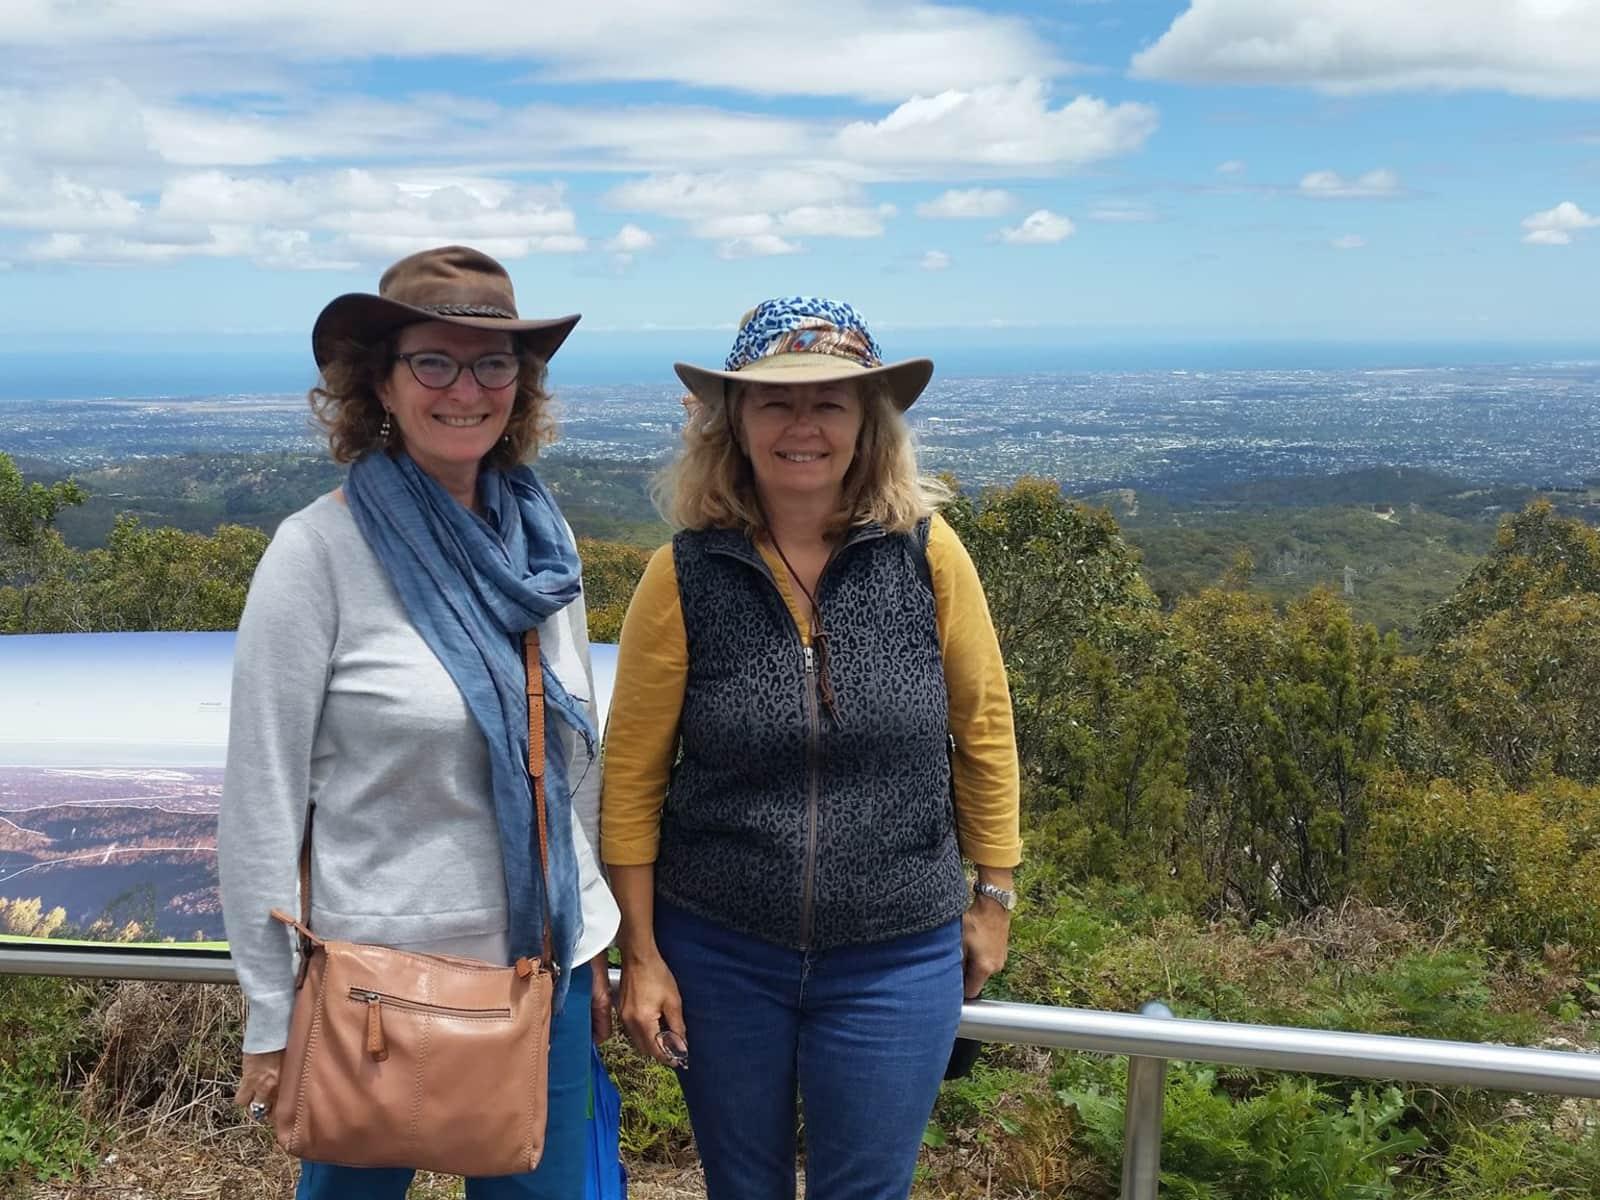 Cheryl & Julie from Melbourne, Victoria, Australia